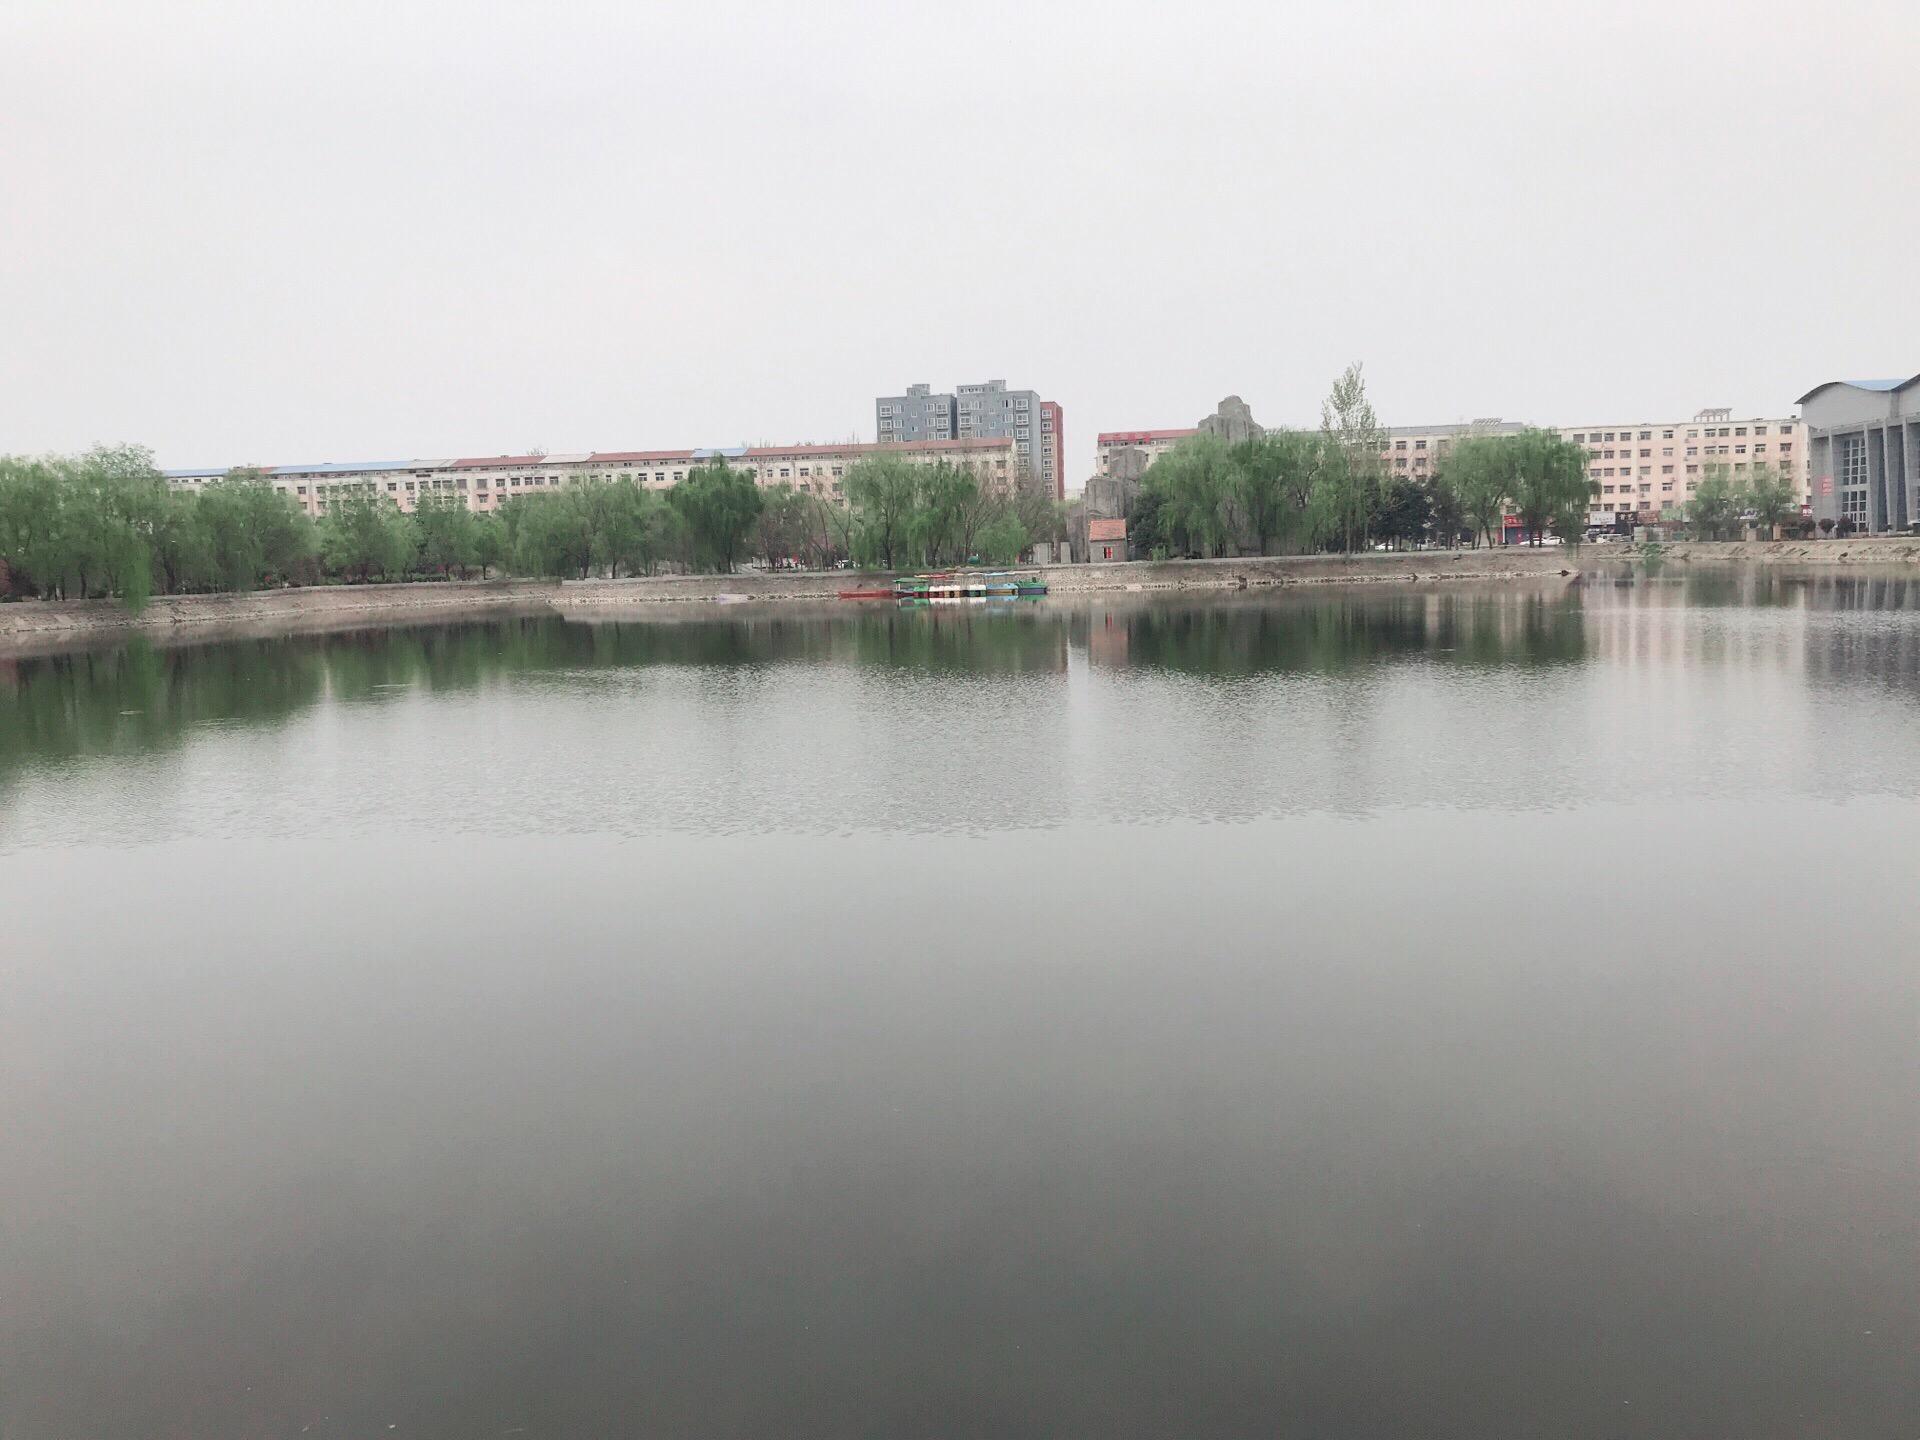 Zhinanzhen Ecological Park